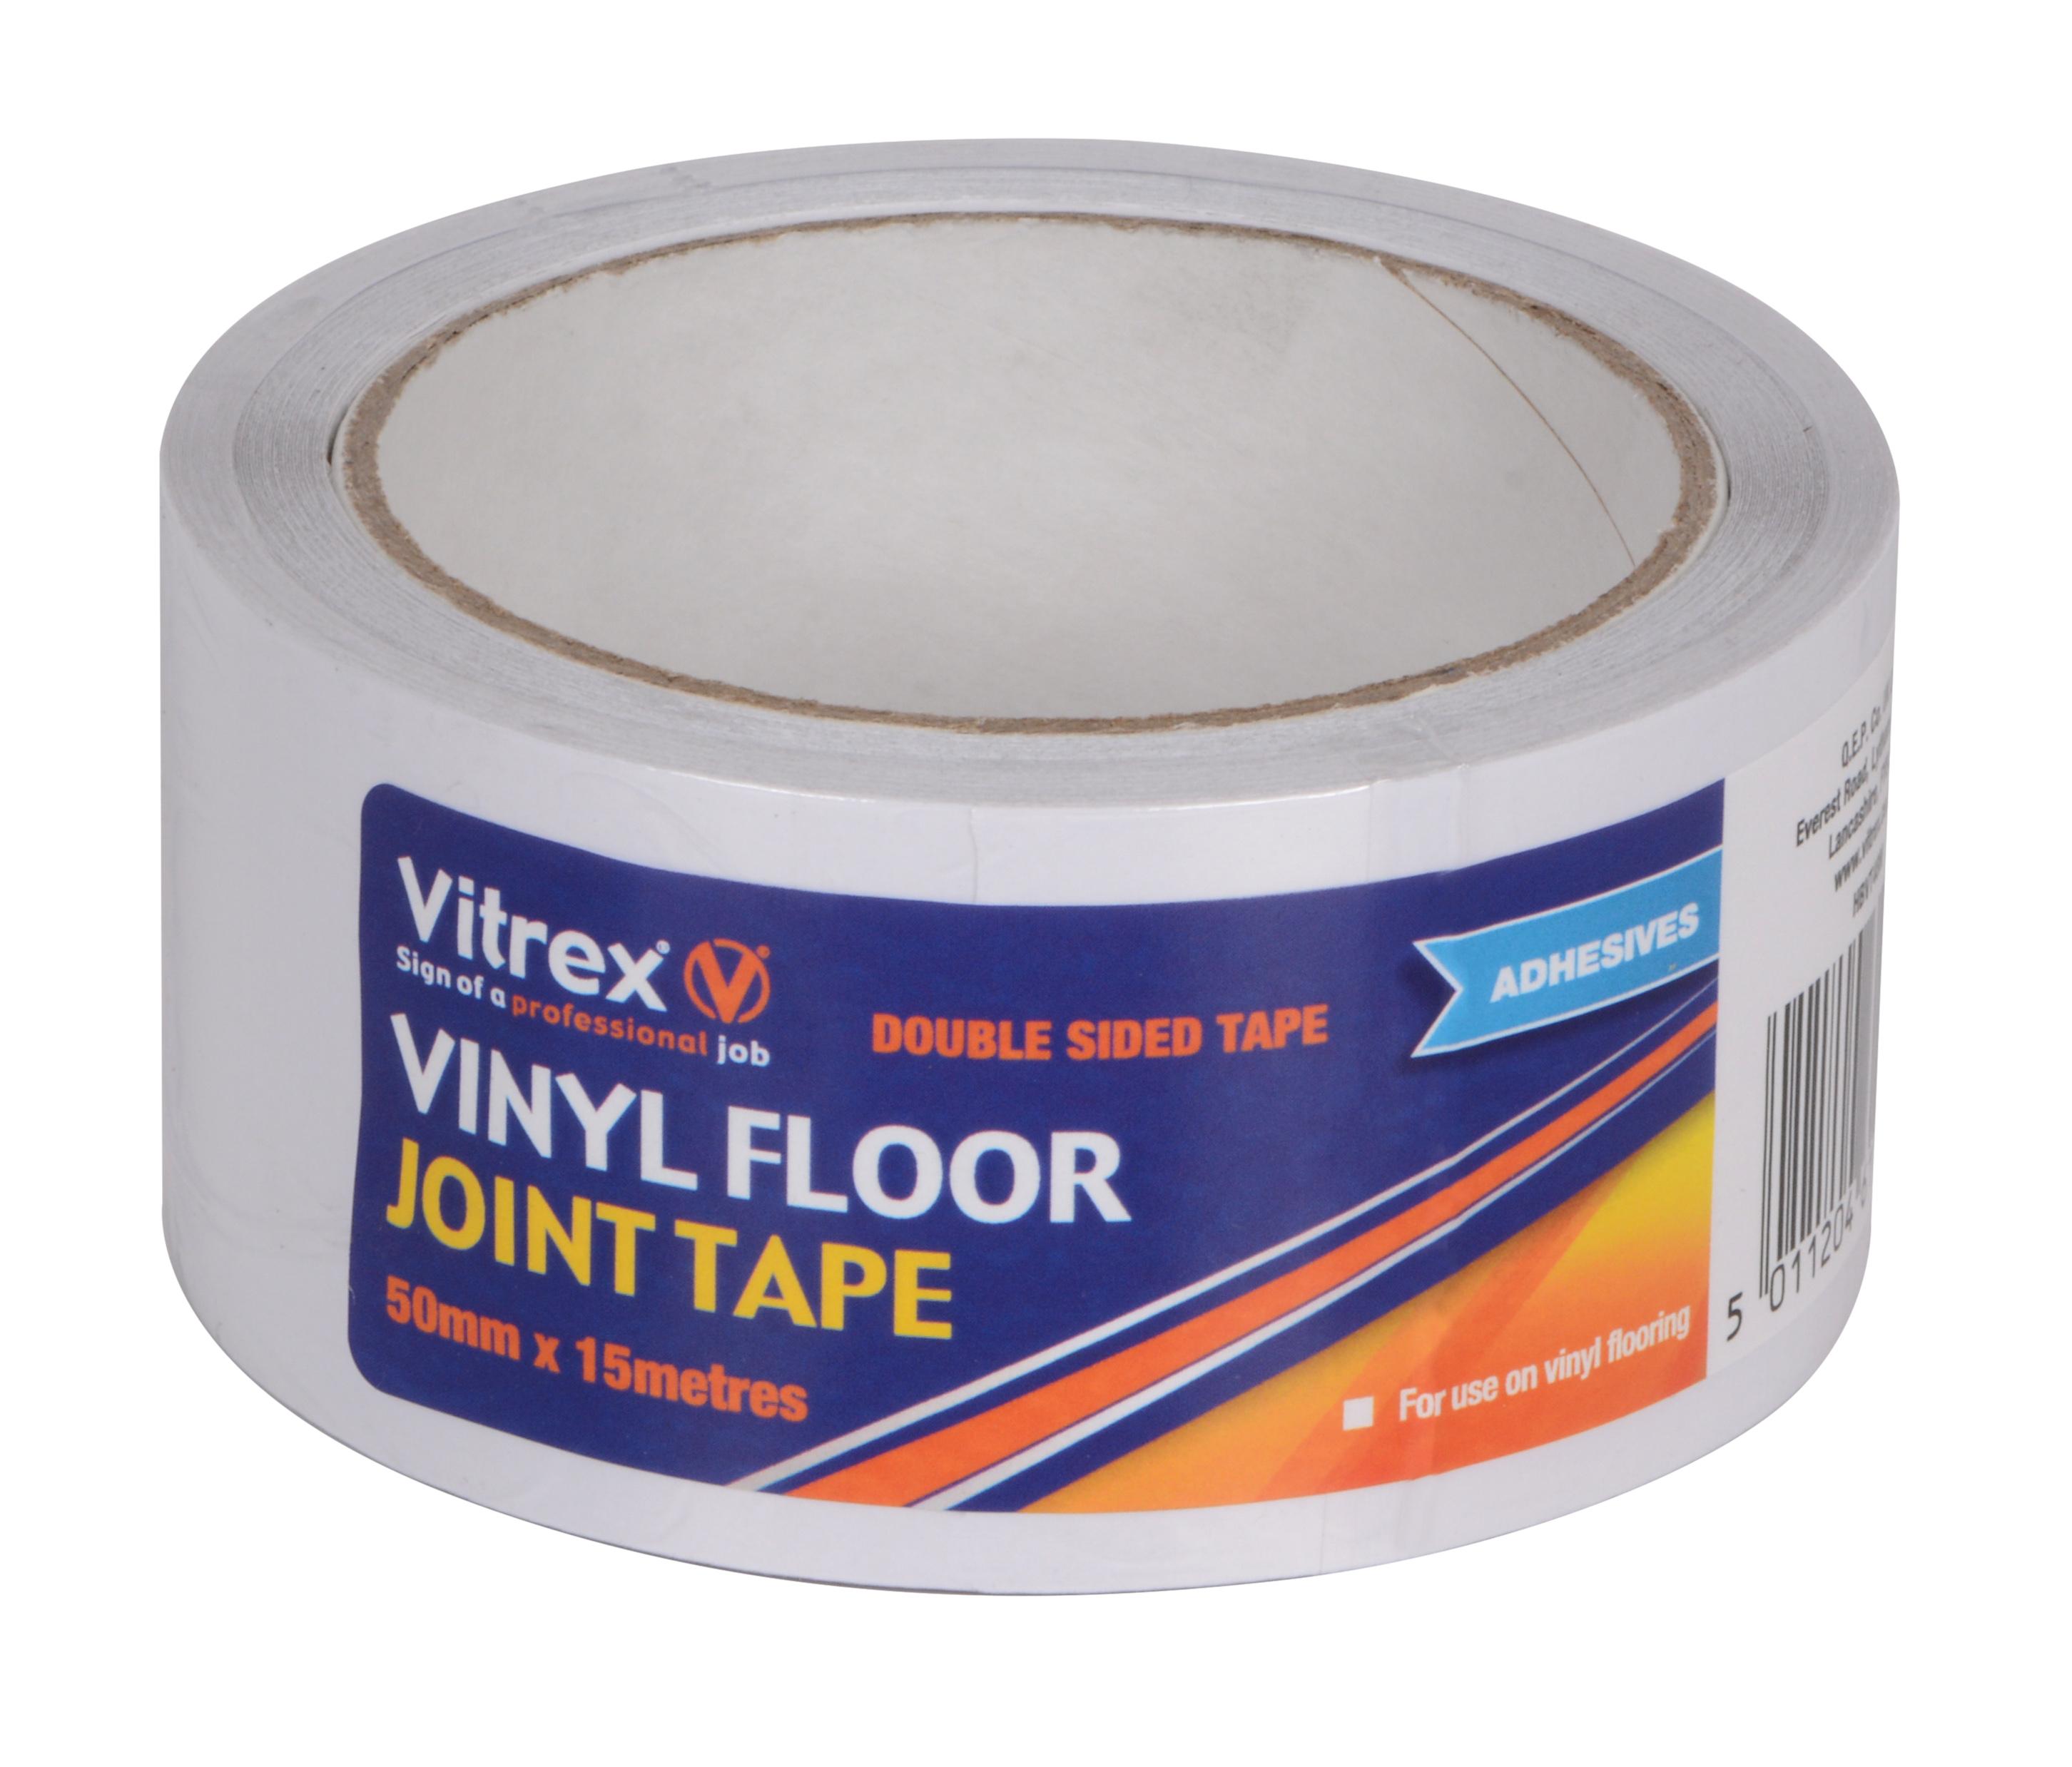 Vinyl Floor Joint Tape 50mm x 15m